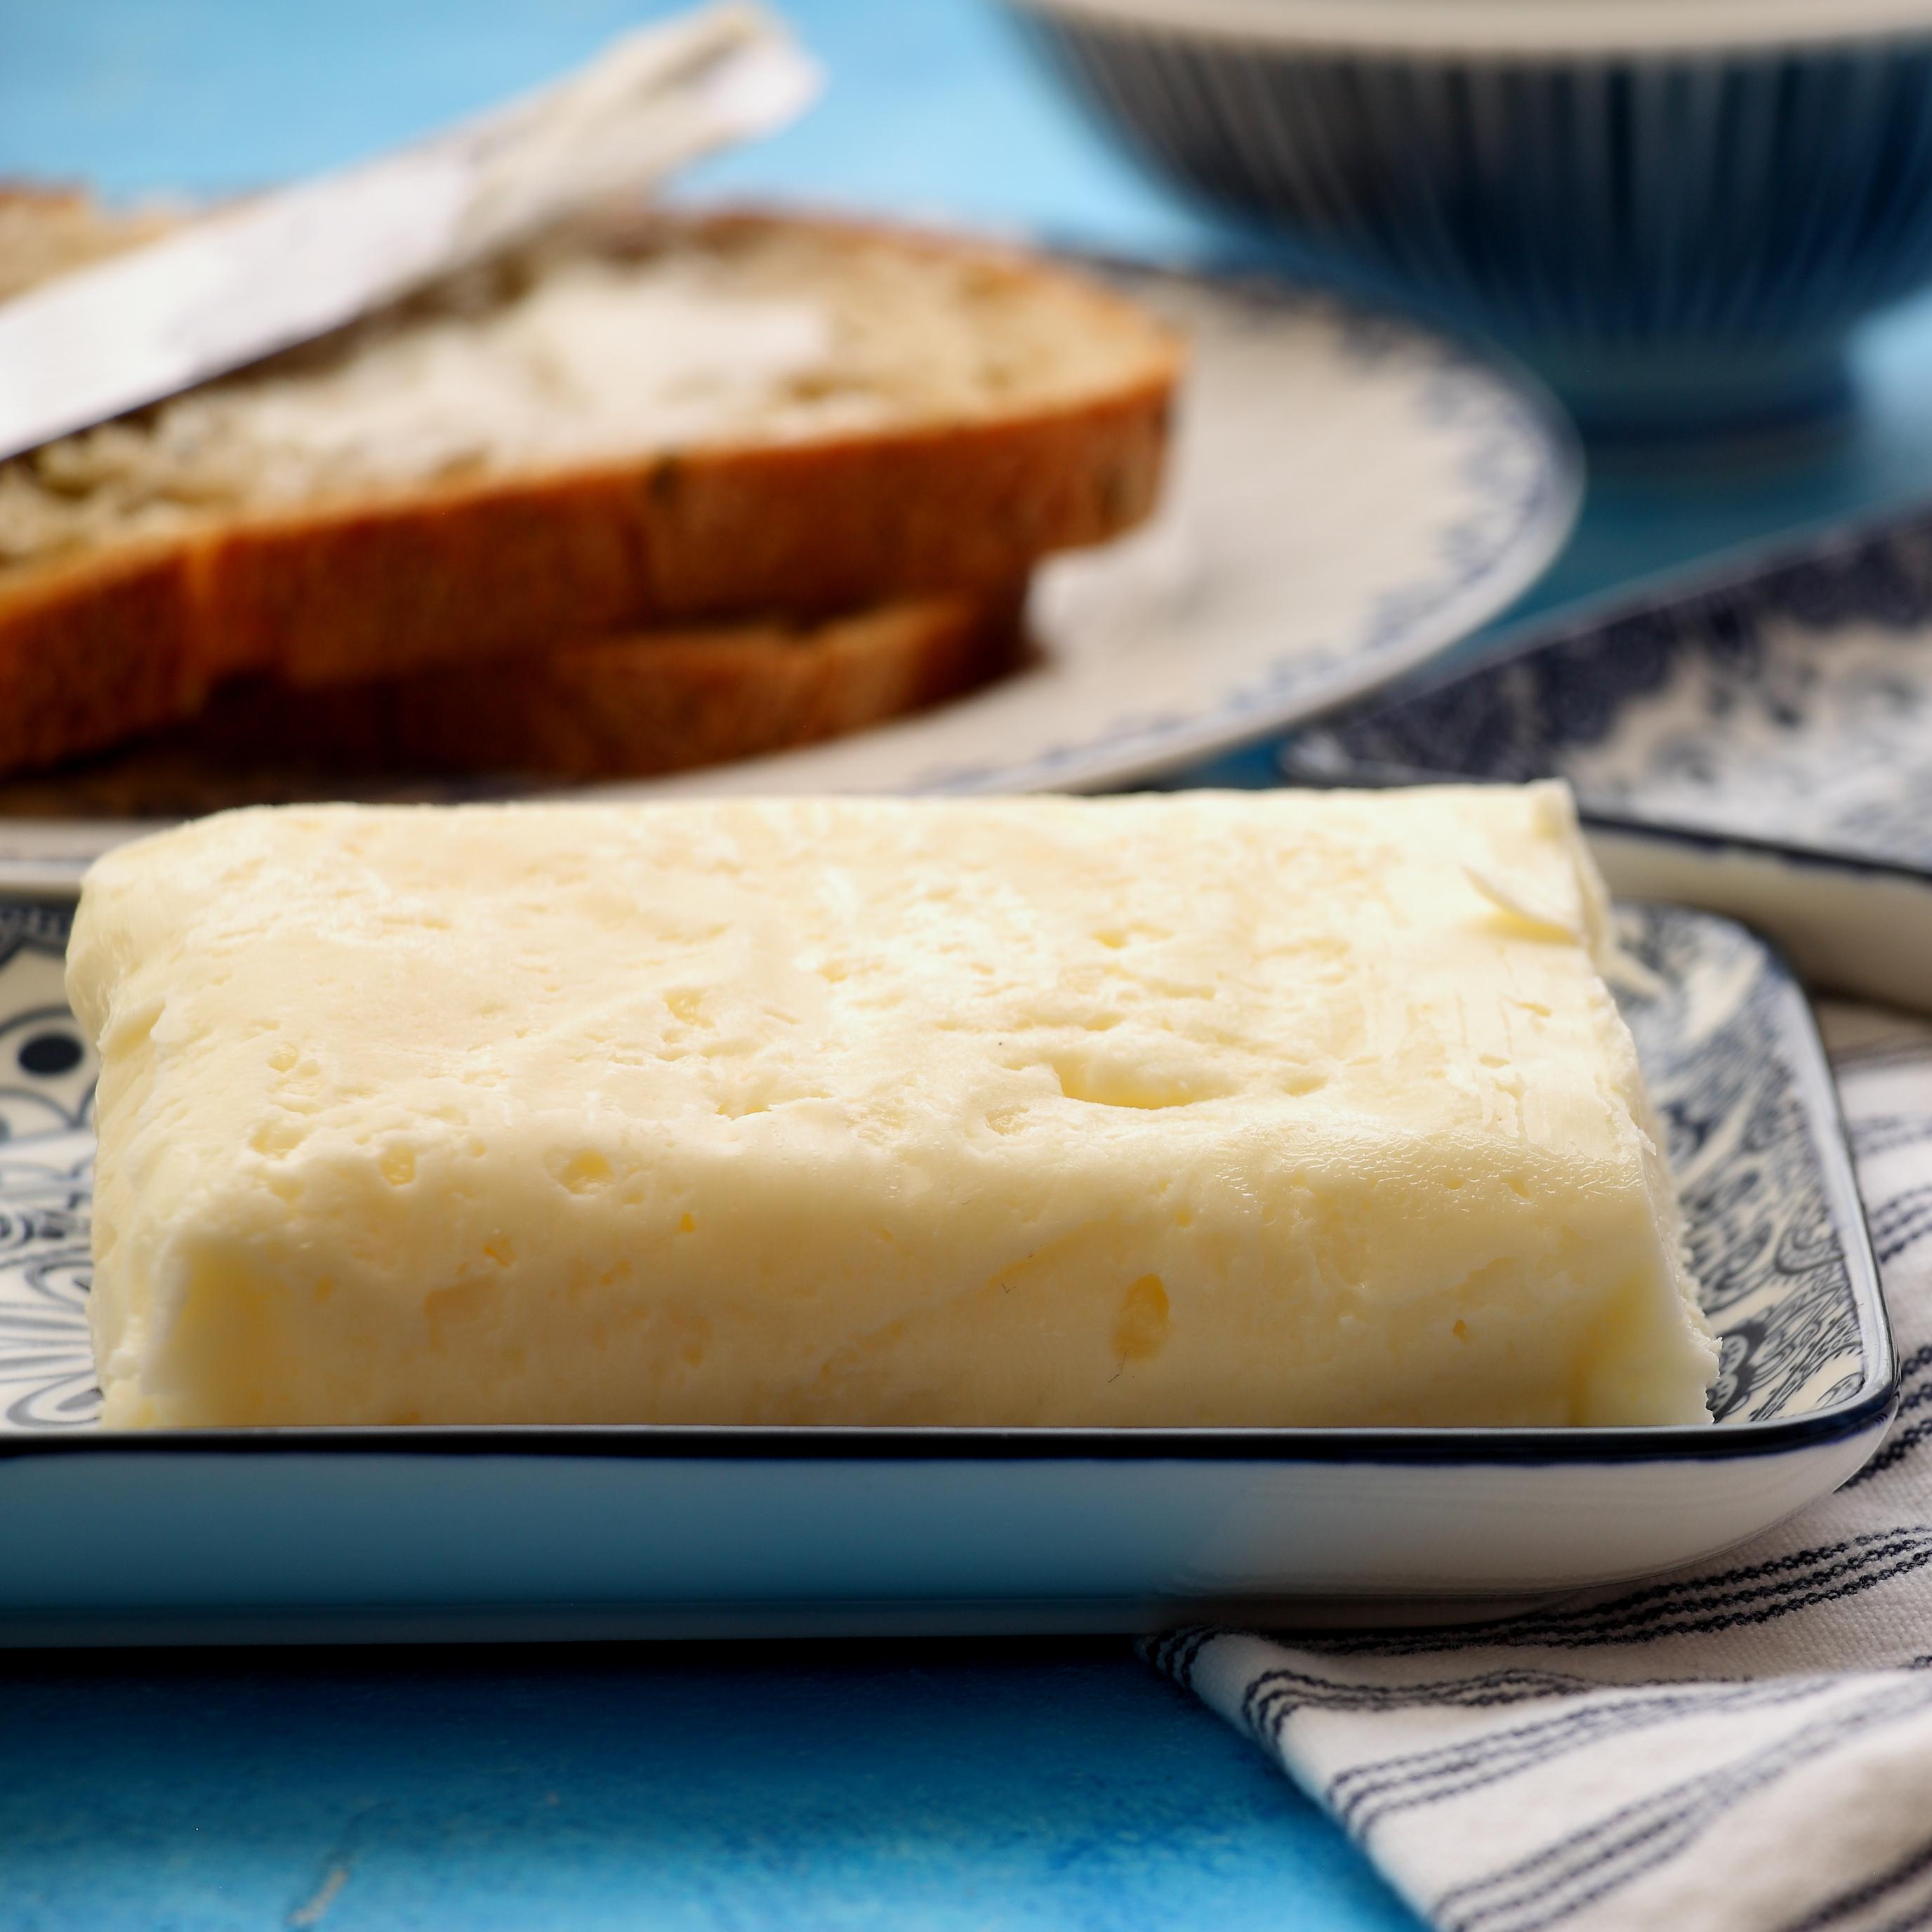 חמאה בבית